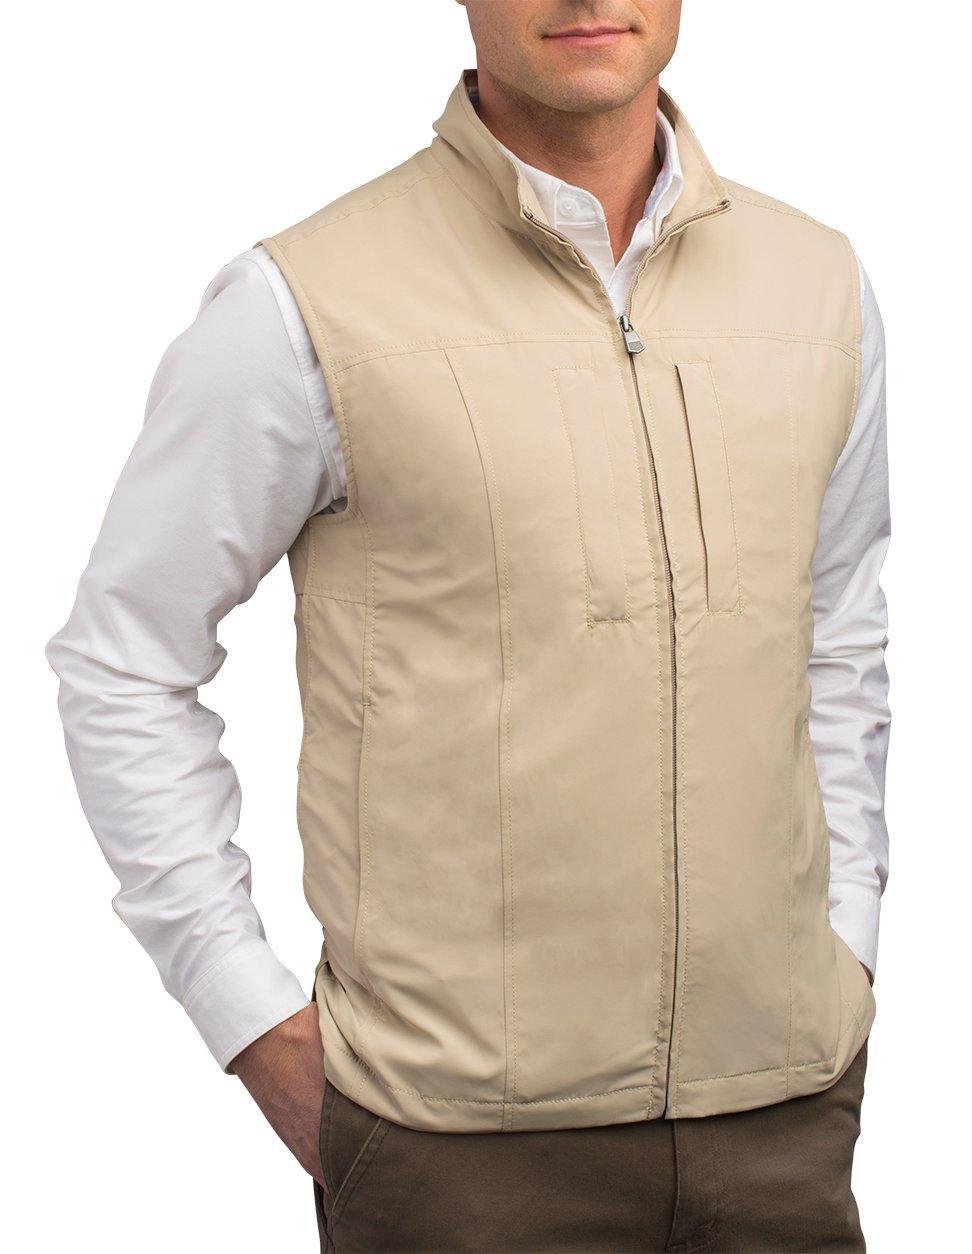 SCOTTeVEST Men's Travel Vest - 24 Pockets Travel Clothing KHA S